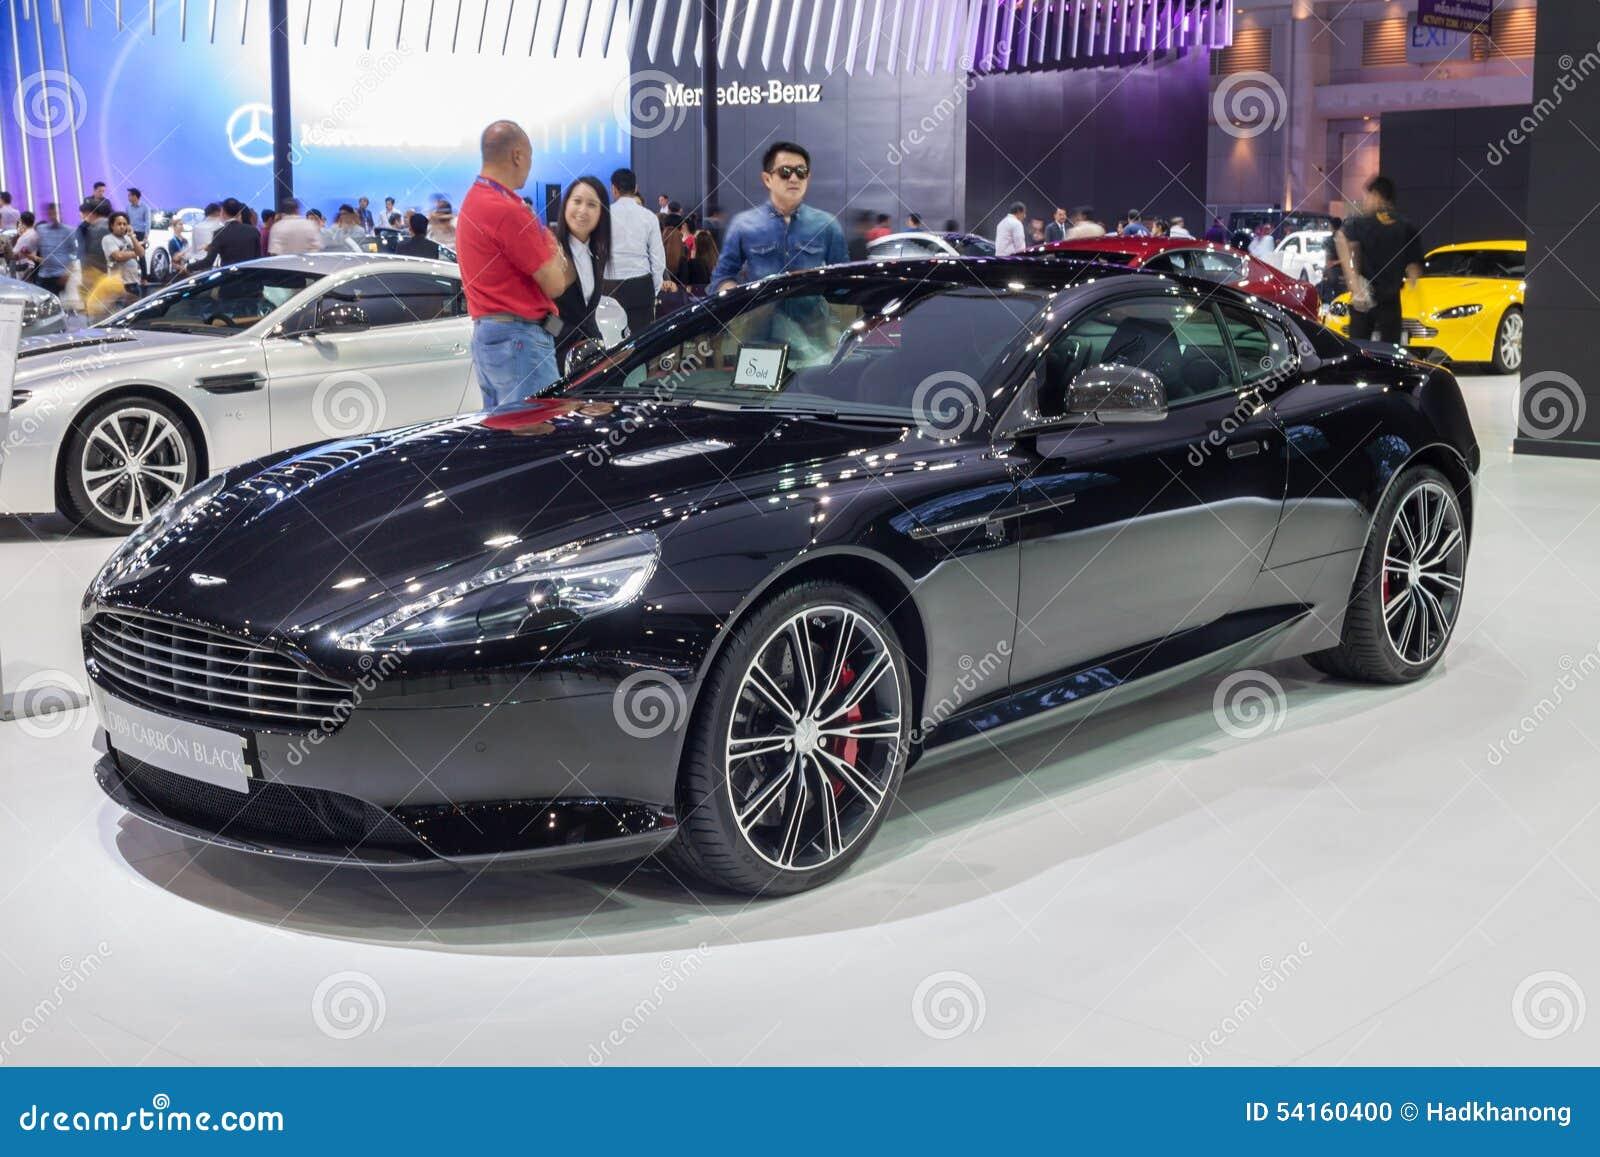 Aston Martin Db9 Carbon Black Editorial Image Image Of Logo Business 54160400